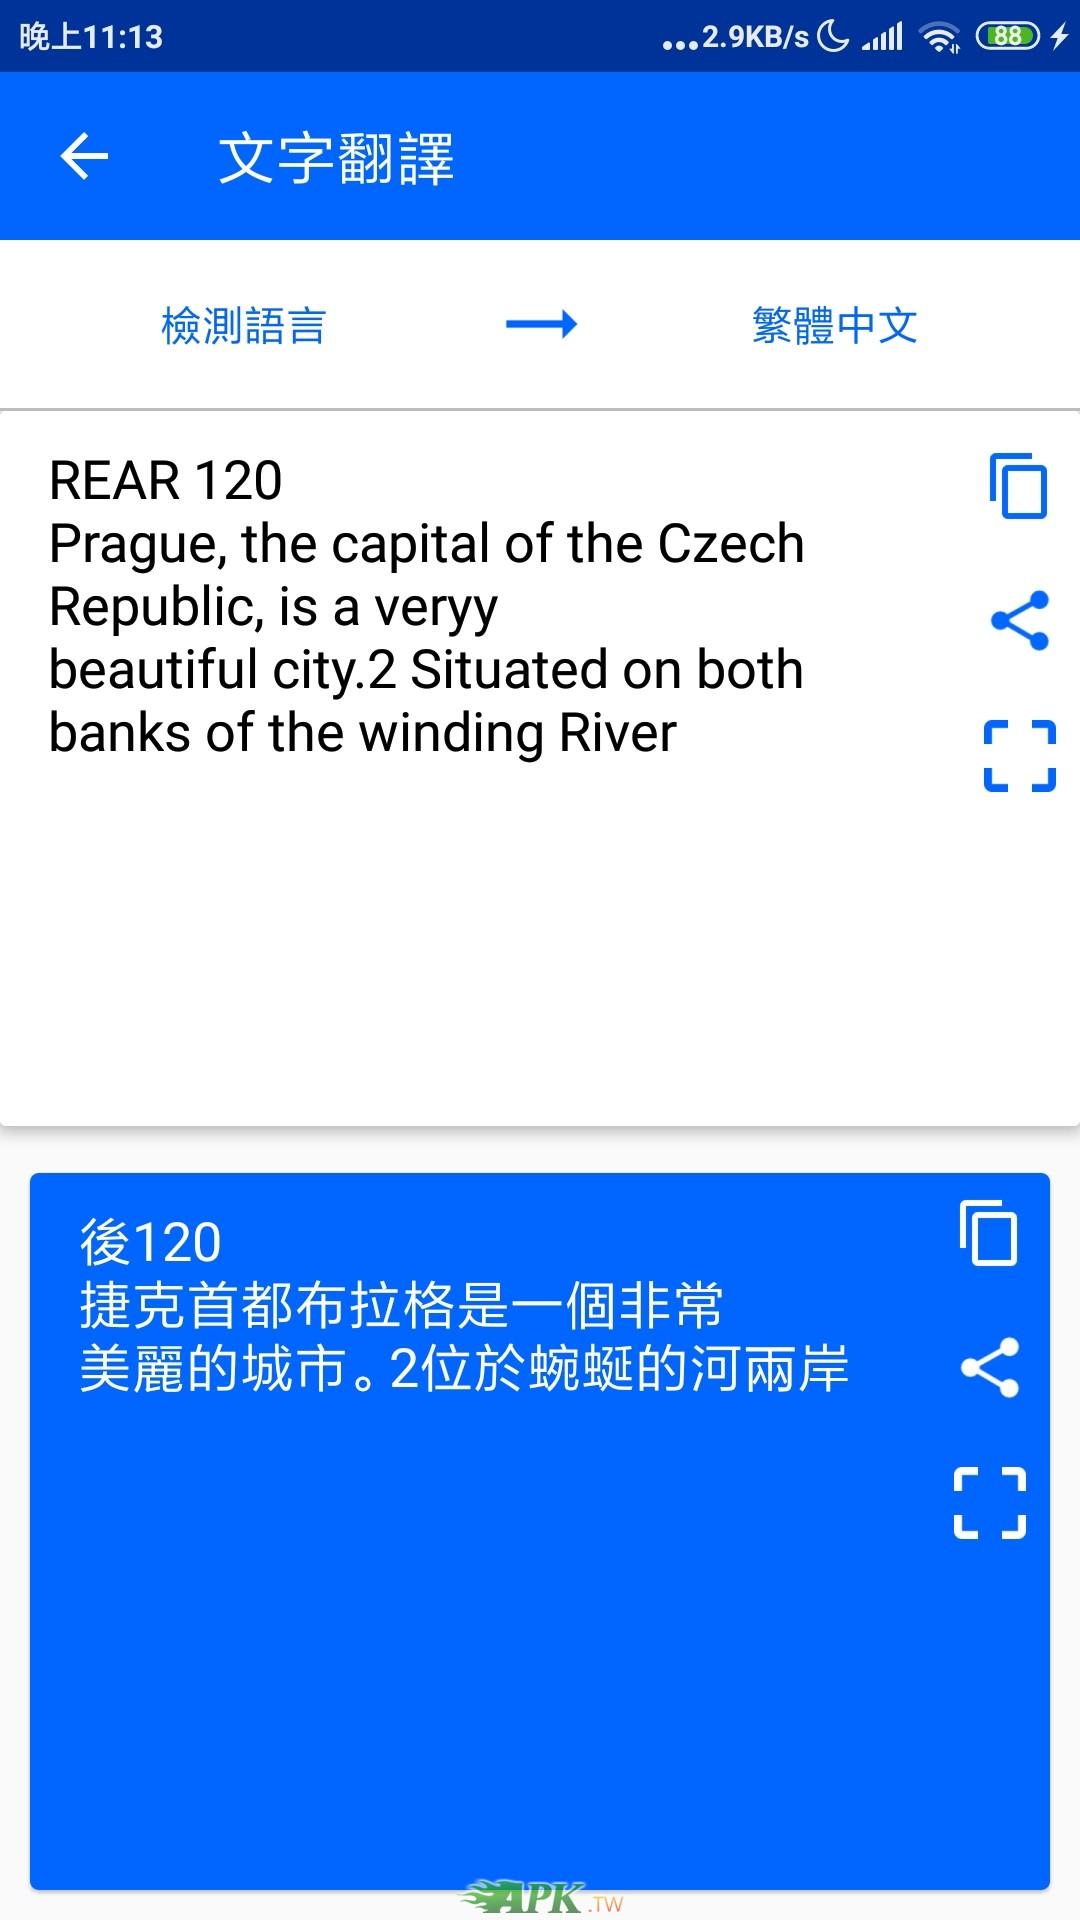 Screenshot_2020-08-17-23-13-36-392_xbean.image.picture.translate.ocr.jpg